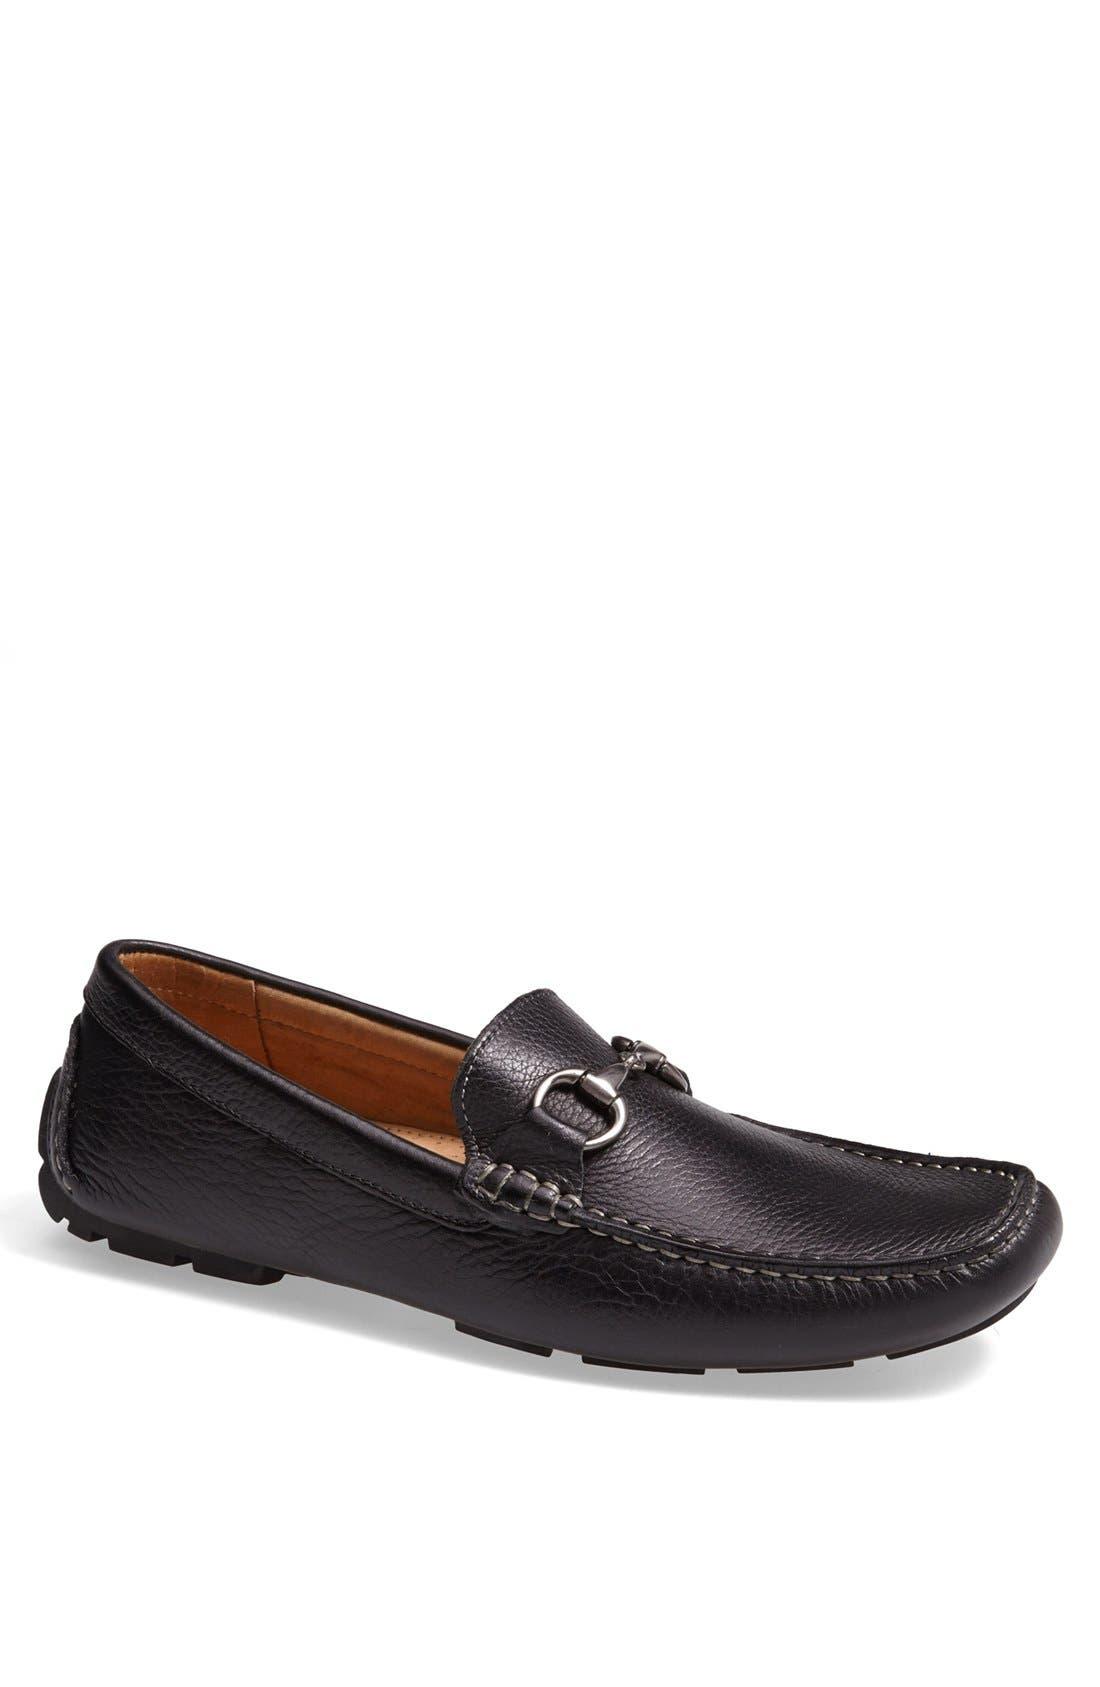 Alternate Image 1 Selected - 1901 'Naples' Driving Shoe (Men)